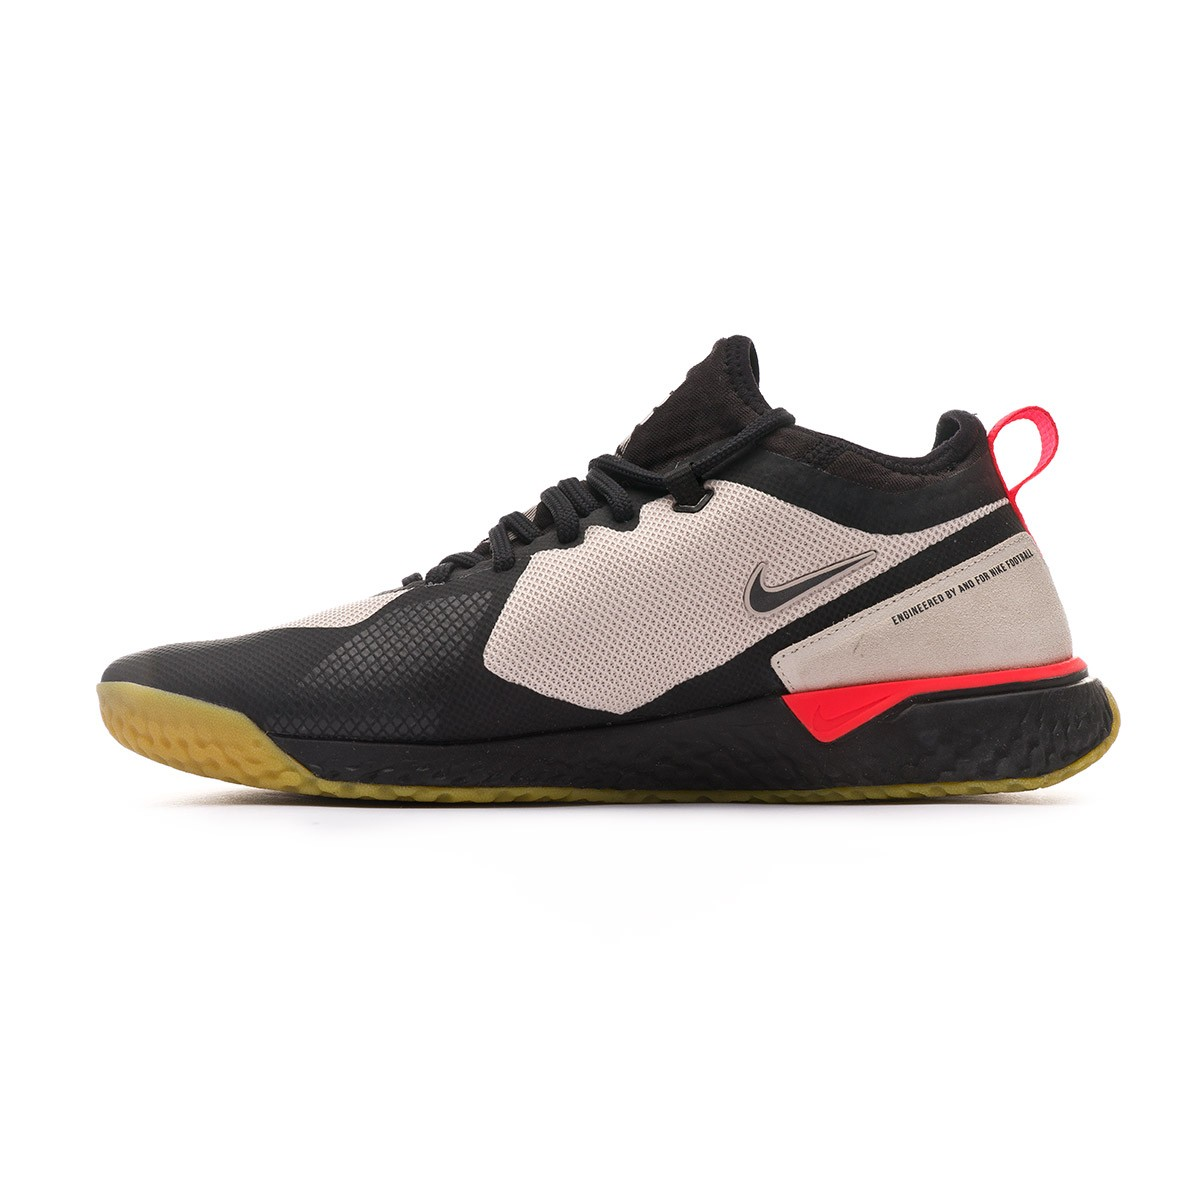 F De Gold Tenis cBlack Bright Tienda Nike Crimson Metallic T51ulFJcK3